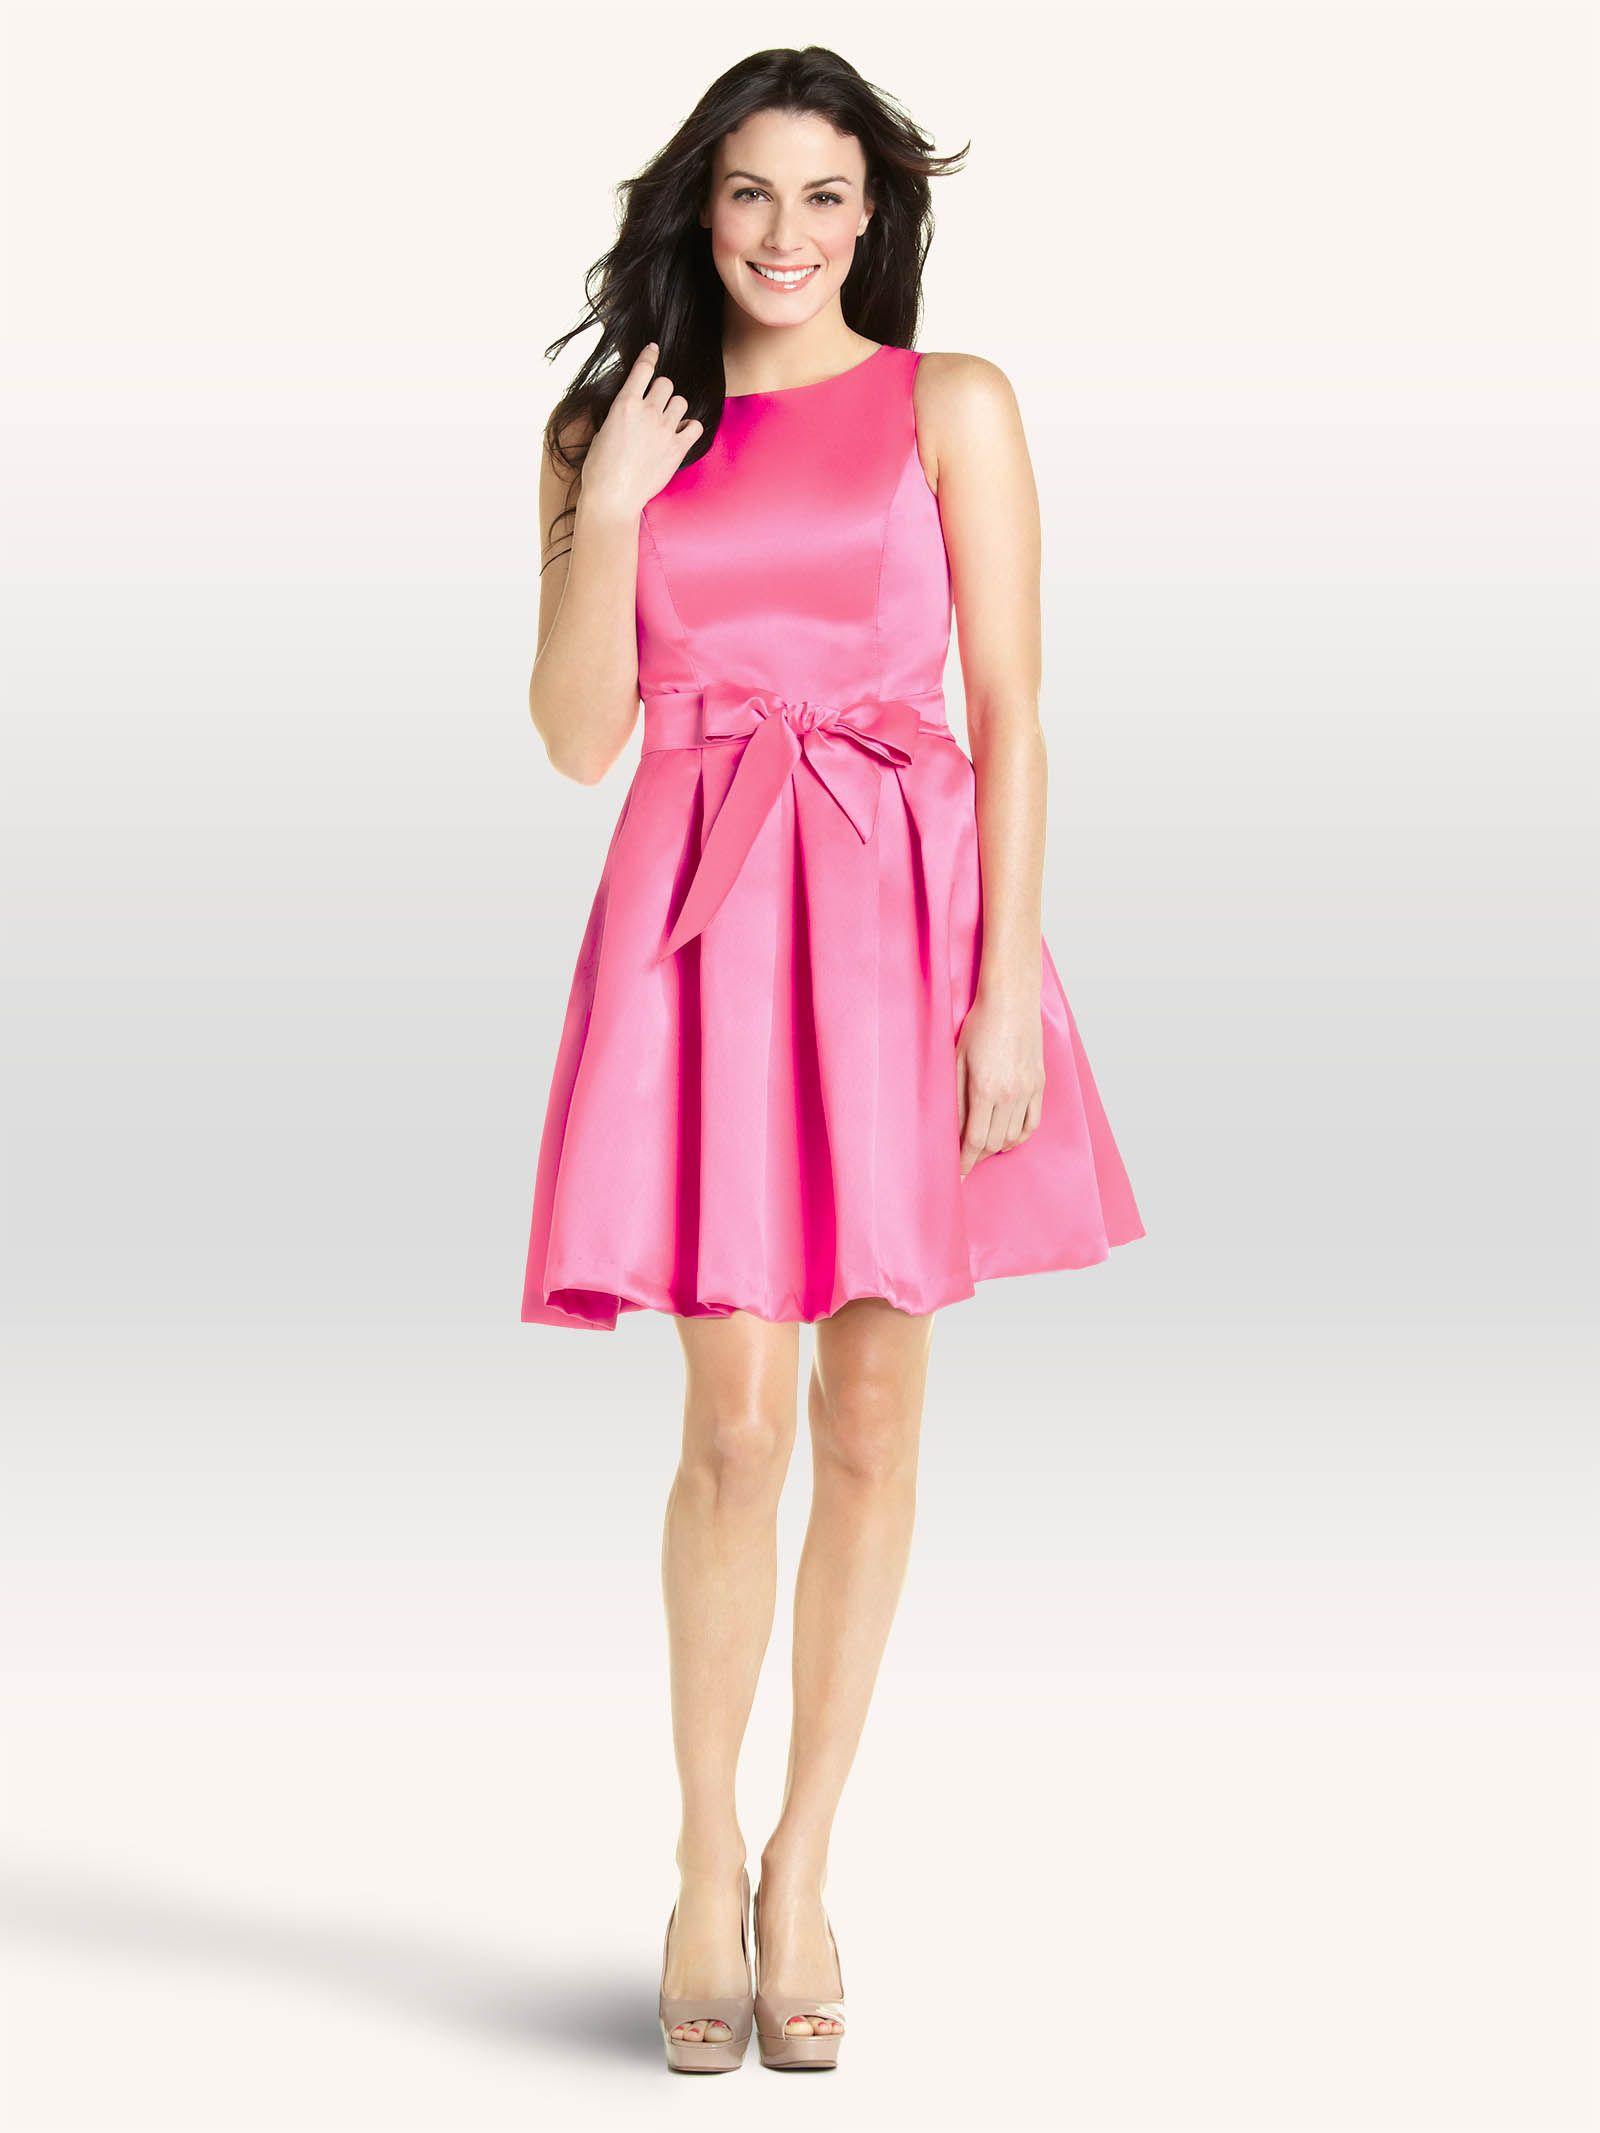 Isaac Mizrahi Pleated Party Dress  Bridesmaid's dresses